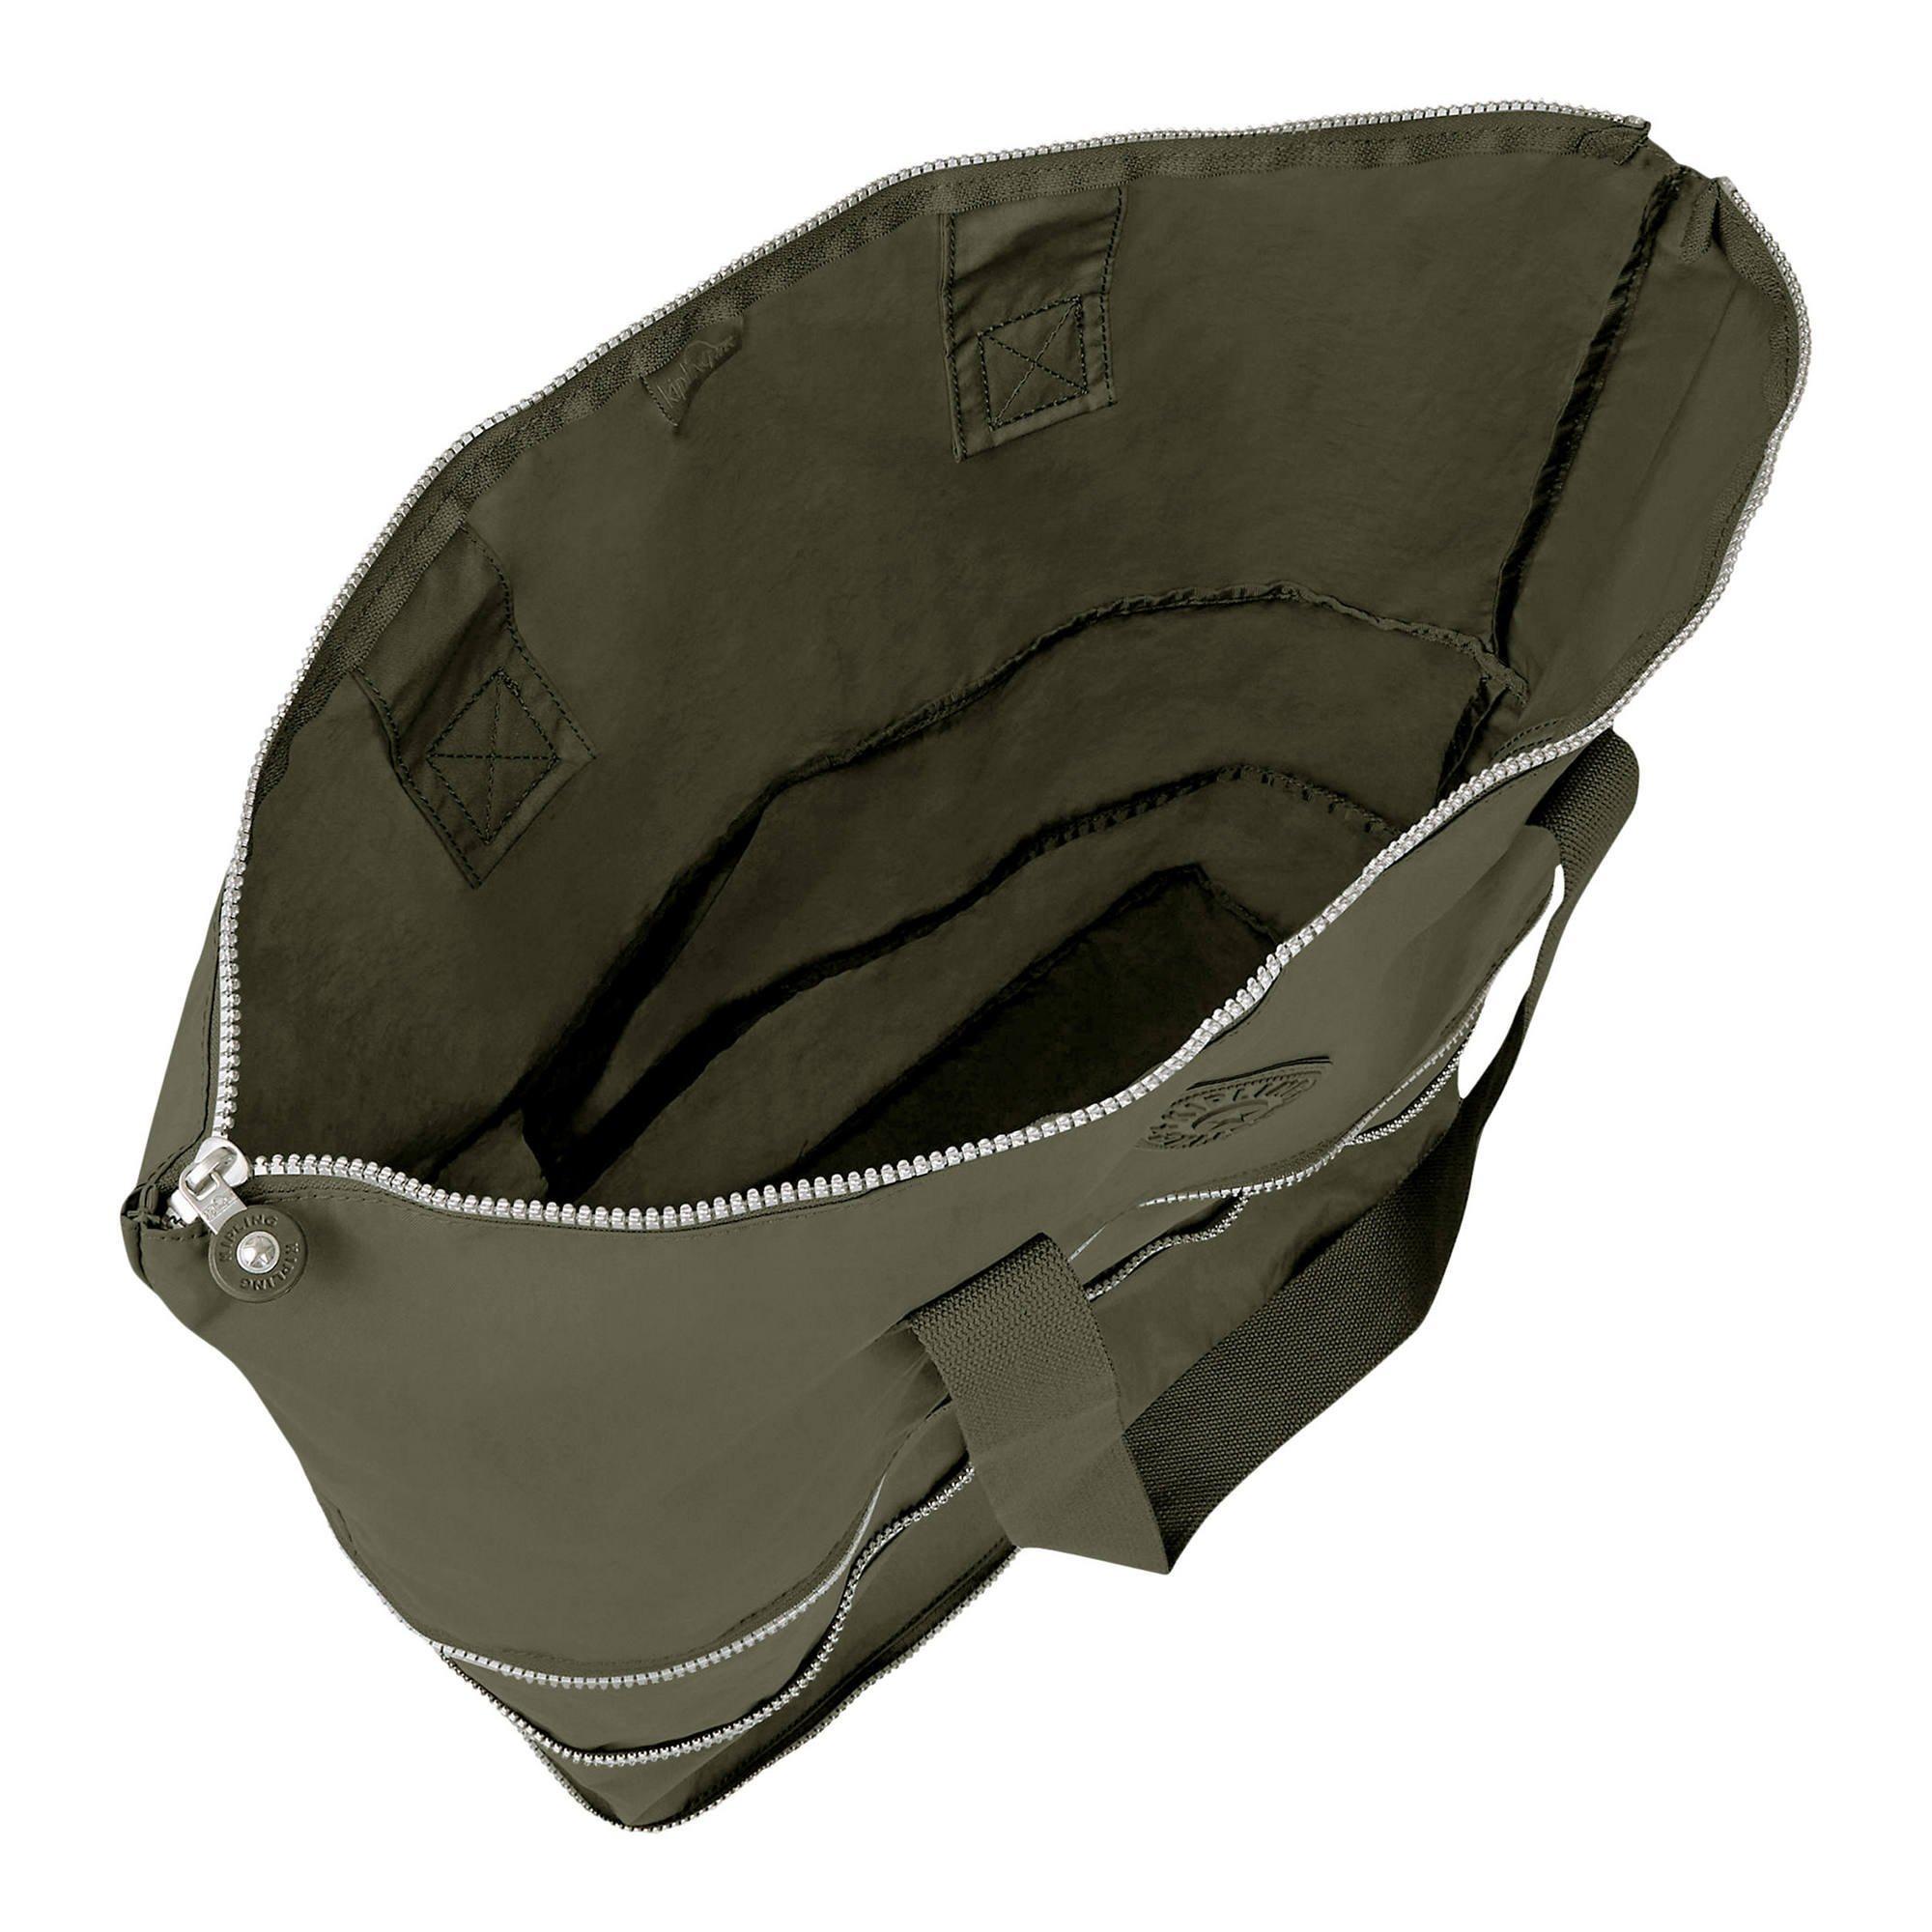 Kipling Imagine Foldable Tote Essential Travel Bag, Jaded Green